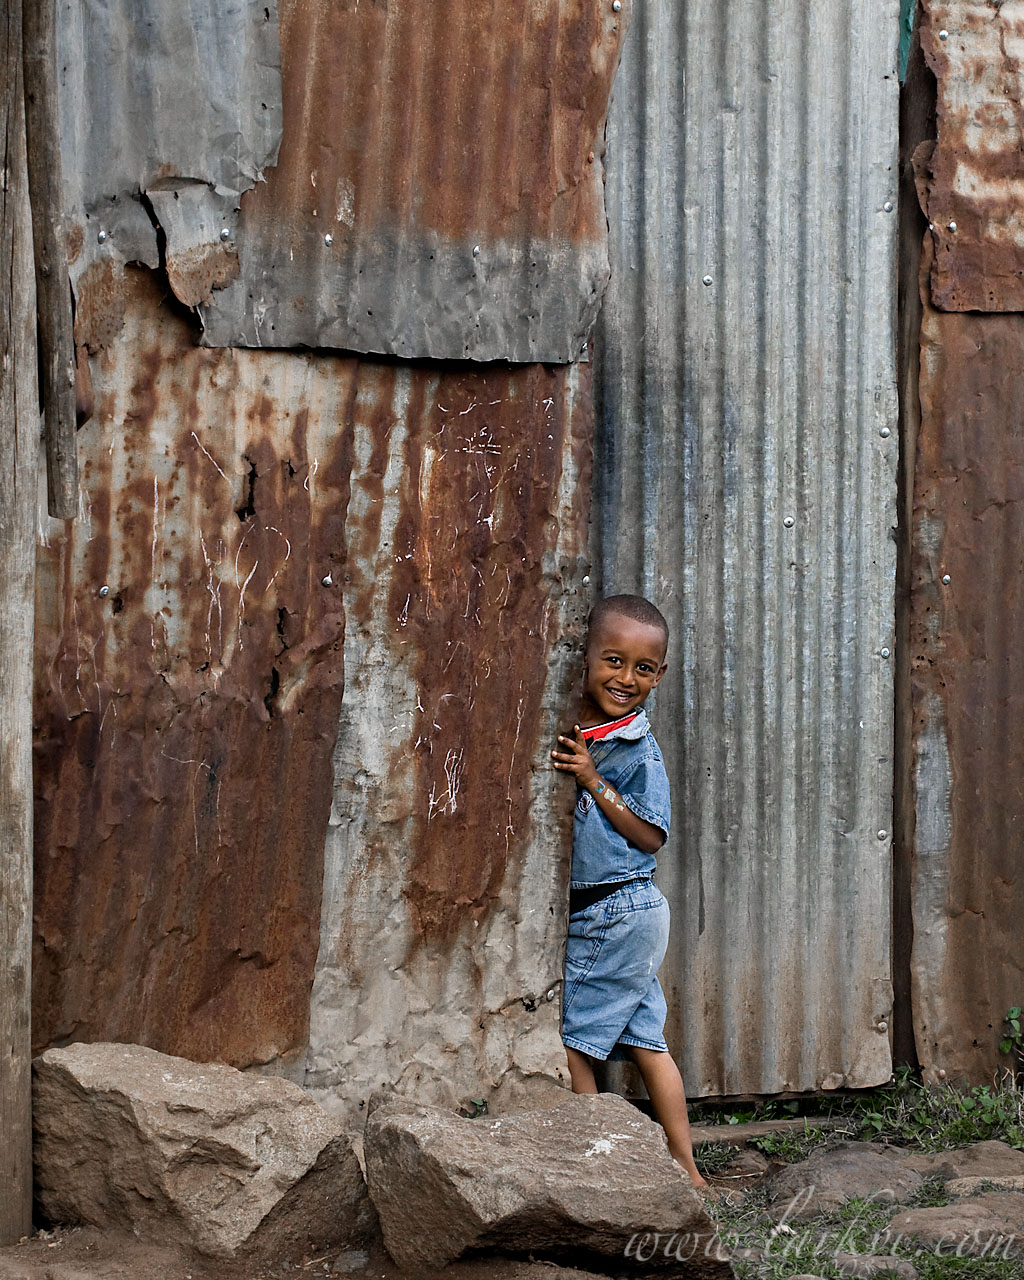 Child in Doorway, Addis Ababa, Ethiopia, November 2008